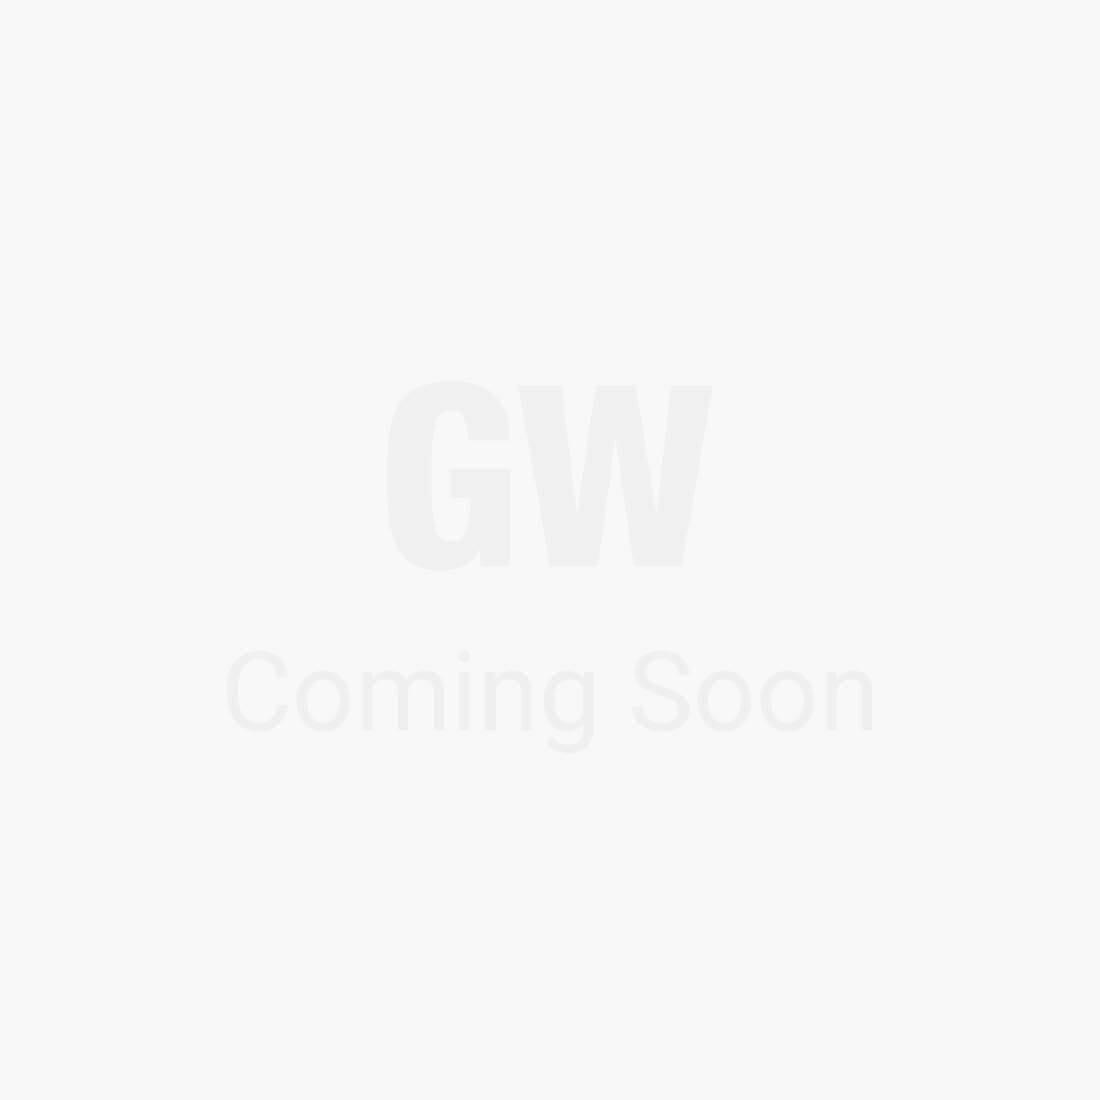 Cabana Link 2 Seater Left Arm Sofa